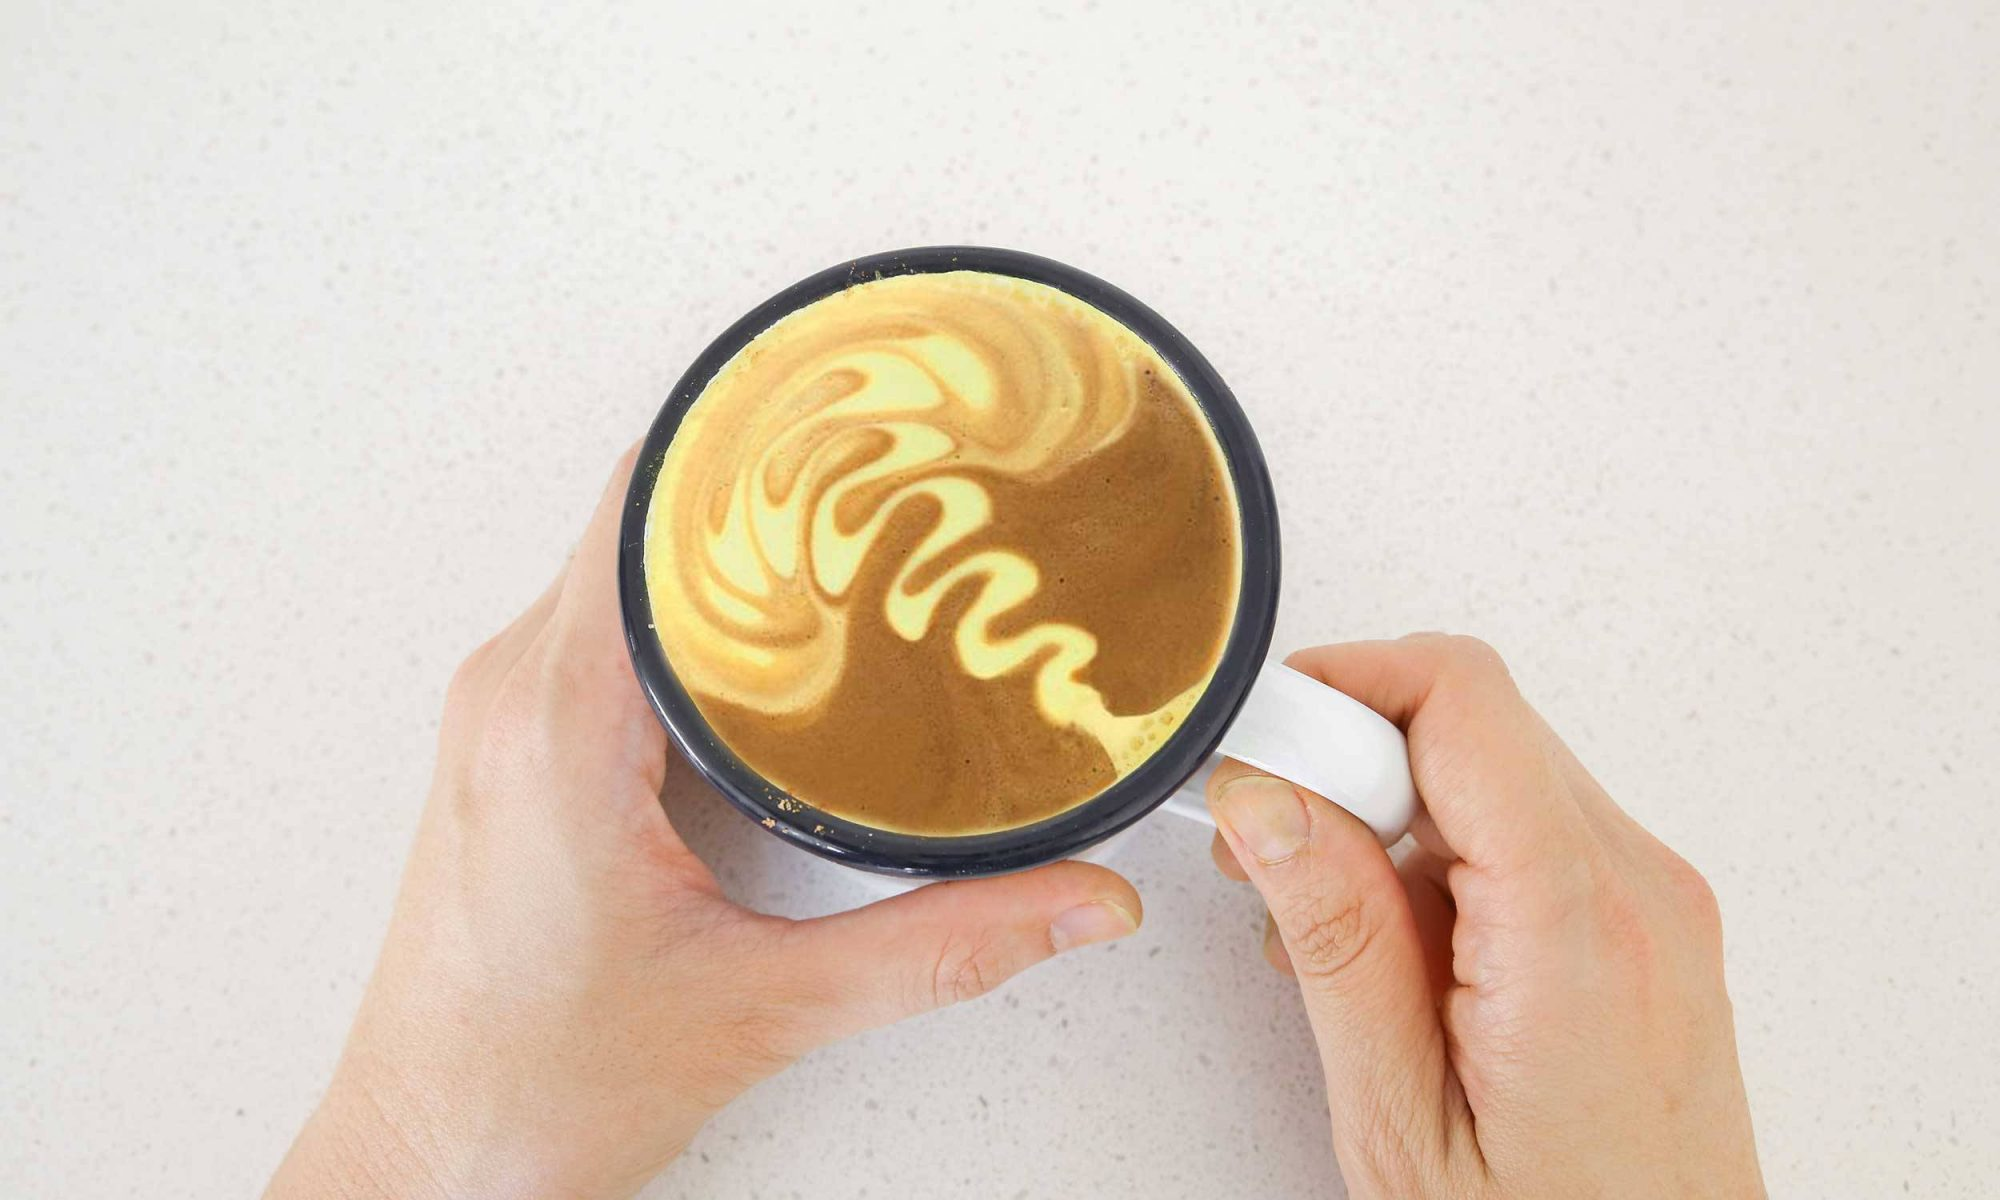 EC: Starbucks Now Serves a Turmeric Latte